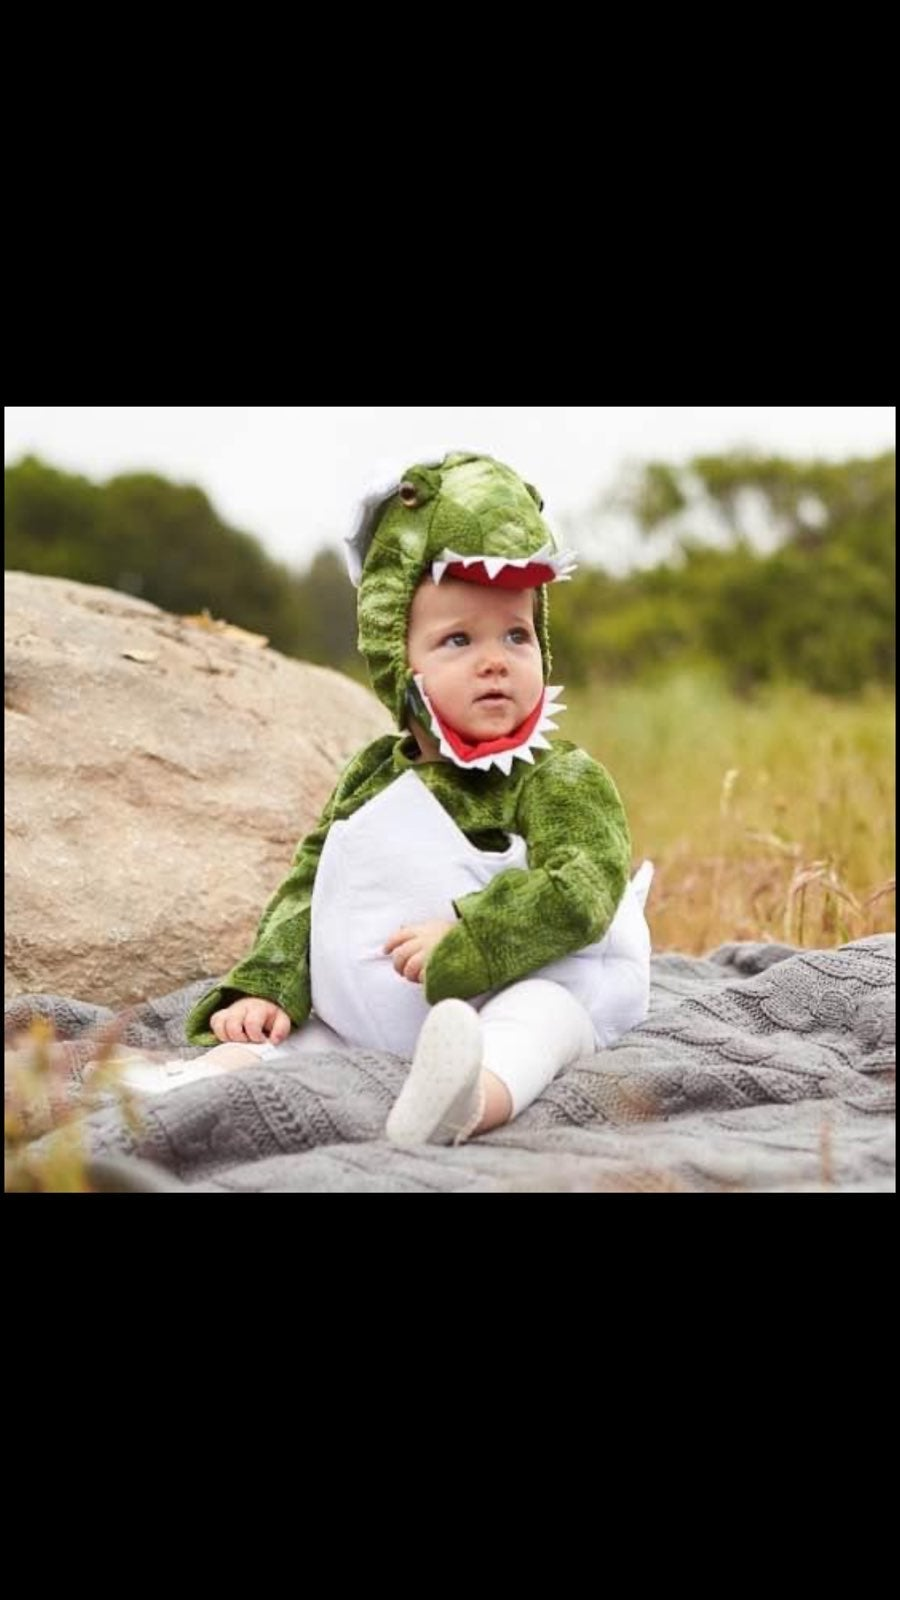 Potter Barn baby dinosaur costume 12-18